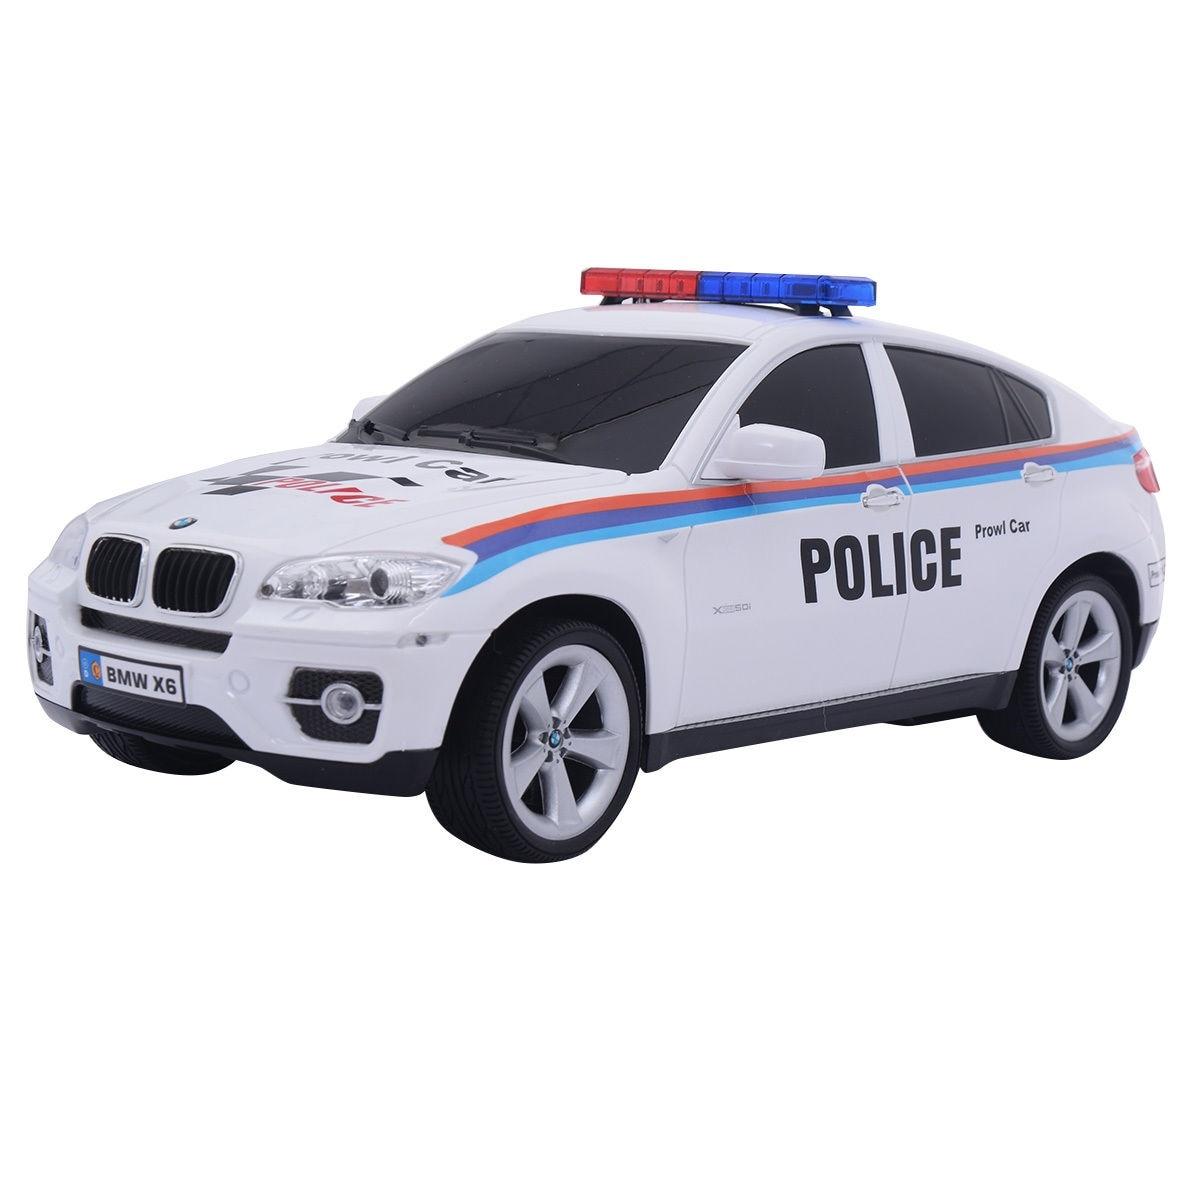 Costway Bmw X6 Licensed Electric Radio Remote Control Rc Police Car White